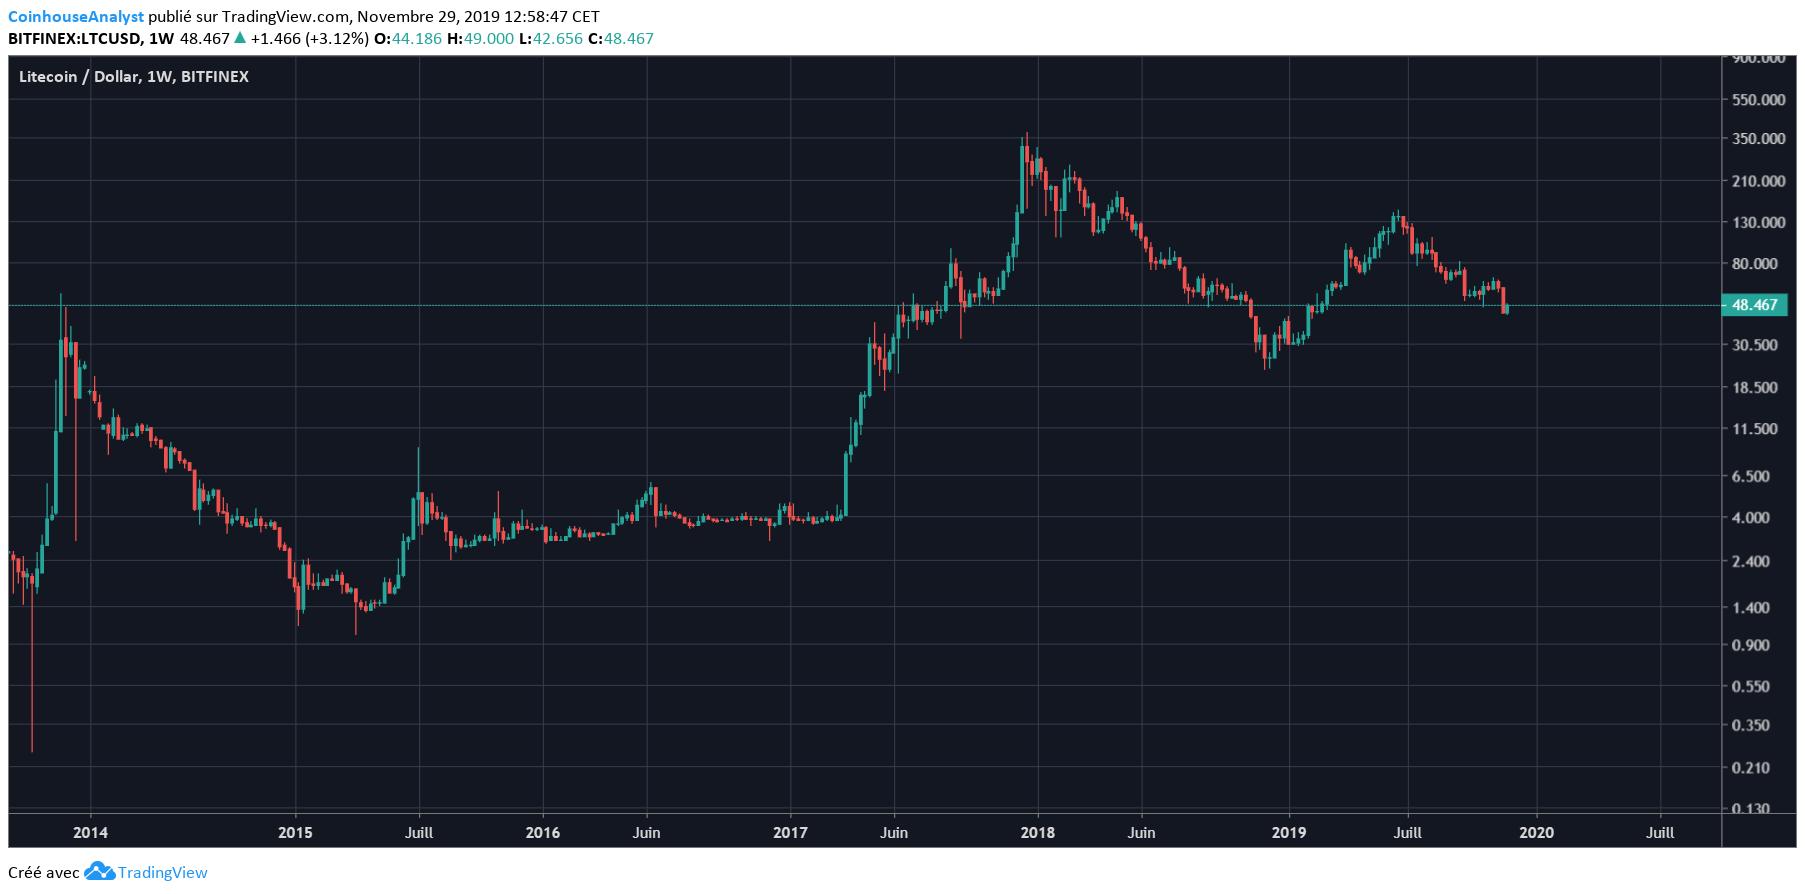 Litecoin Price Chart History